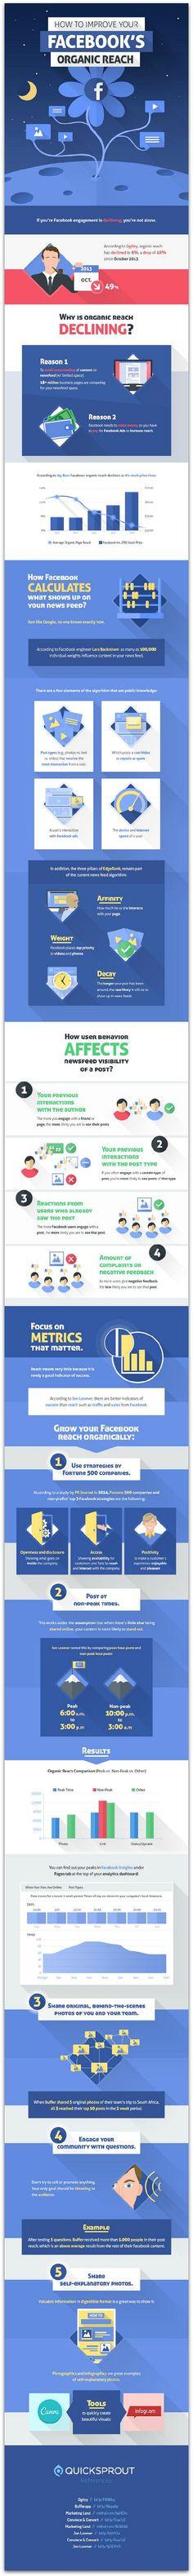 #Infographic: How to increase your organic reach on Facebook #Facebook #SocialMedia